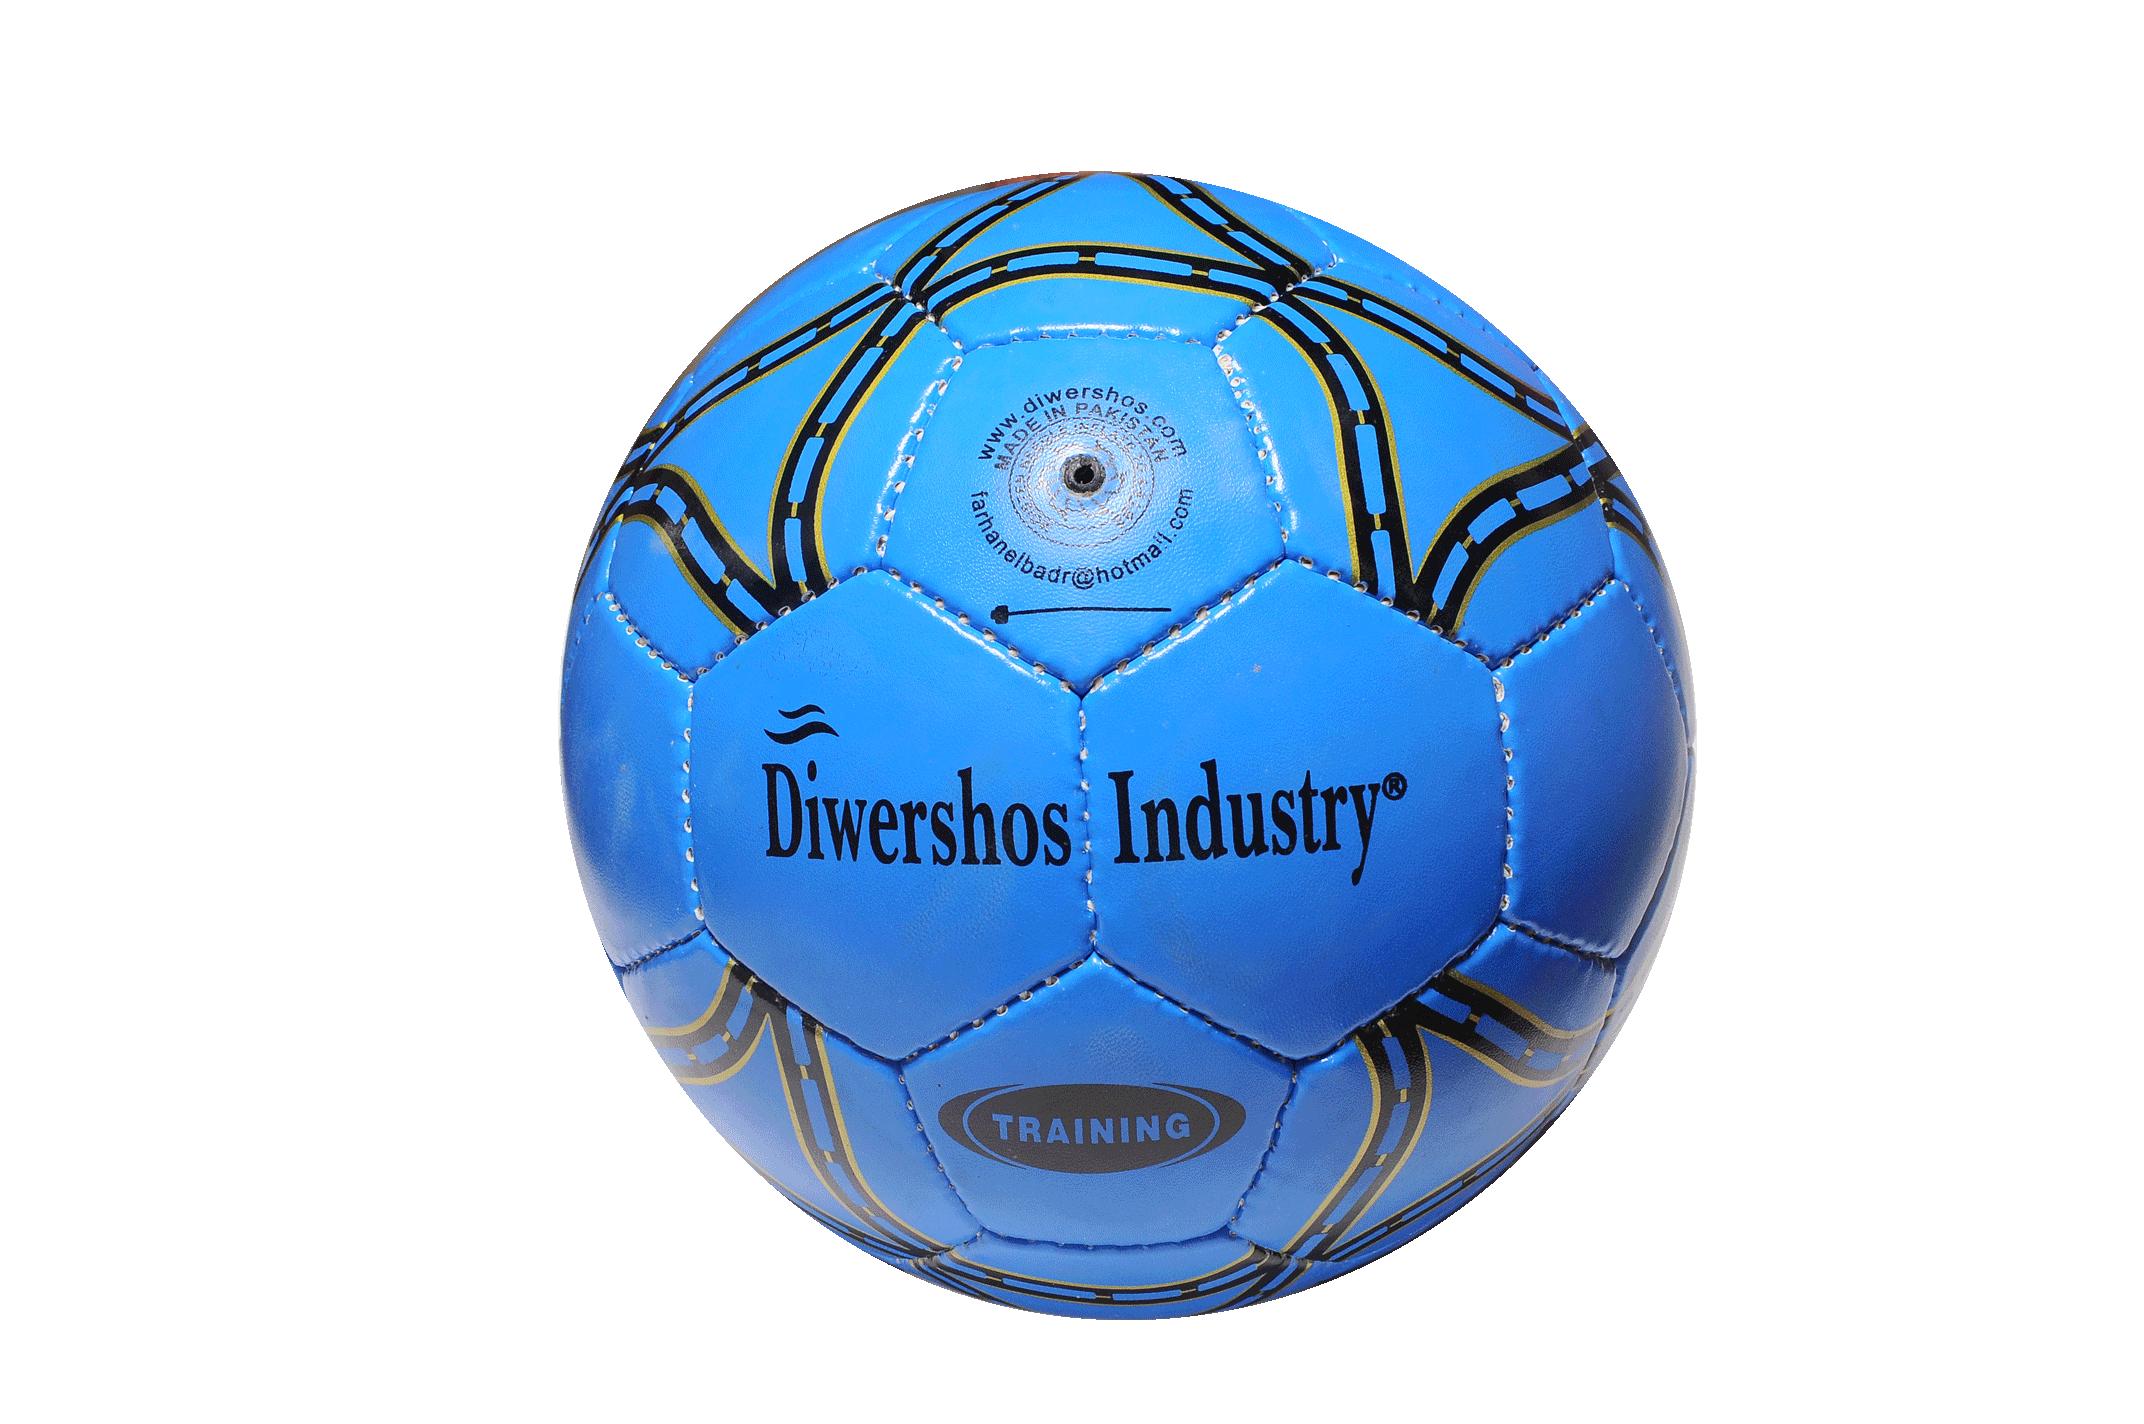 9e5bdd500621e Ballon de foot de la marque Diwershos